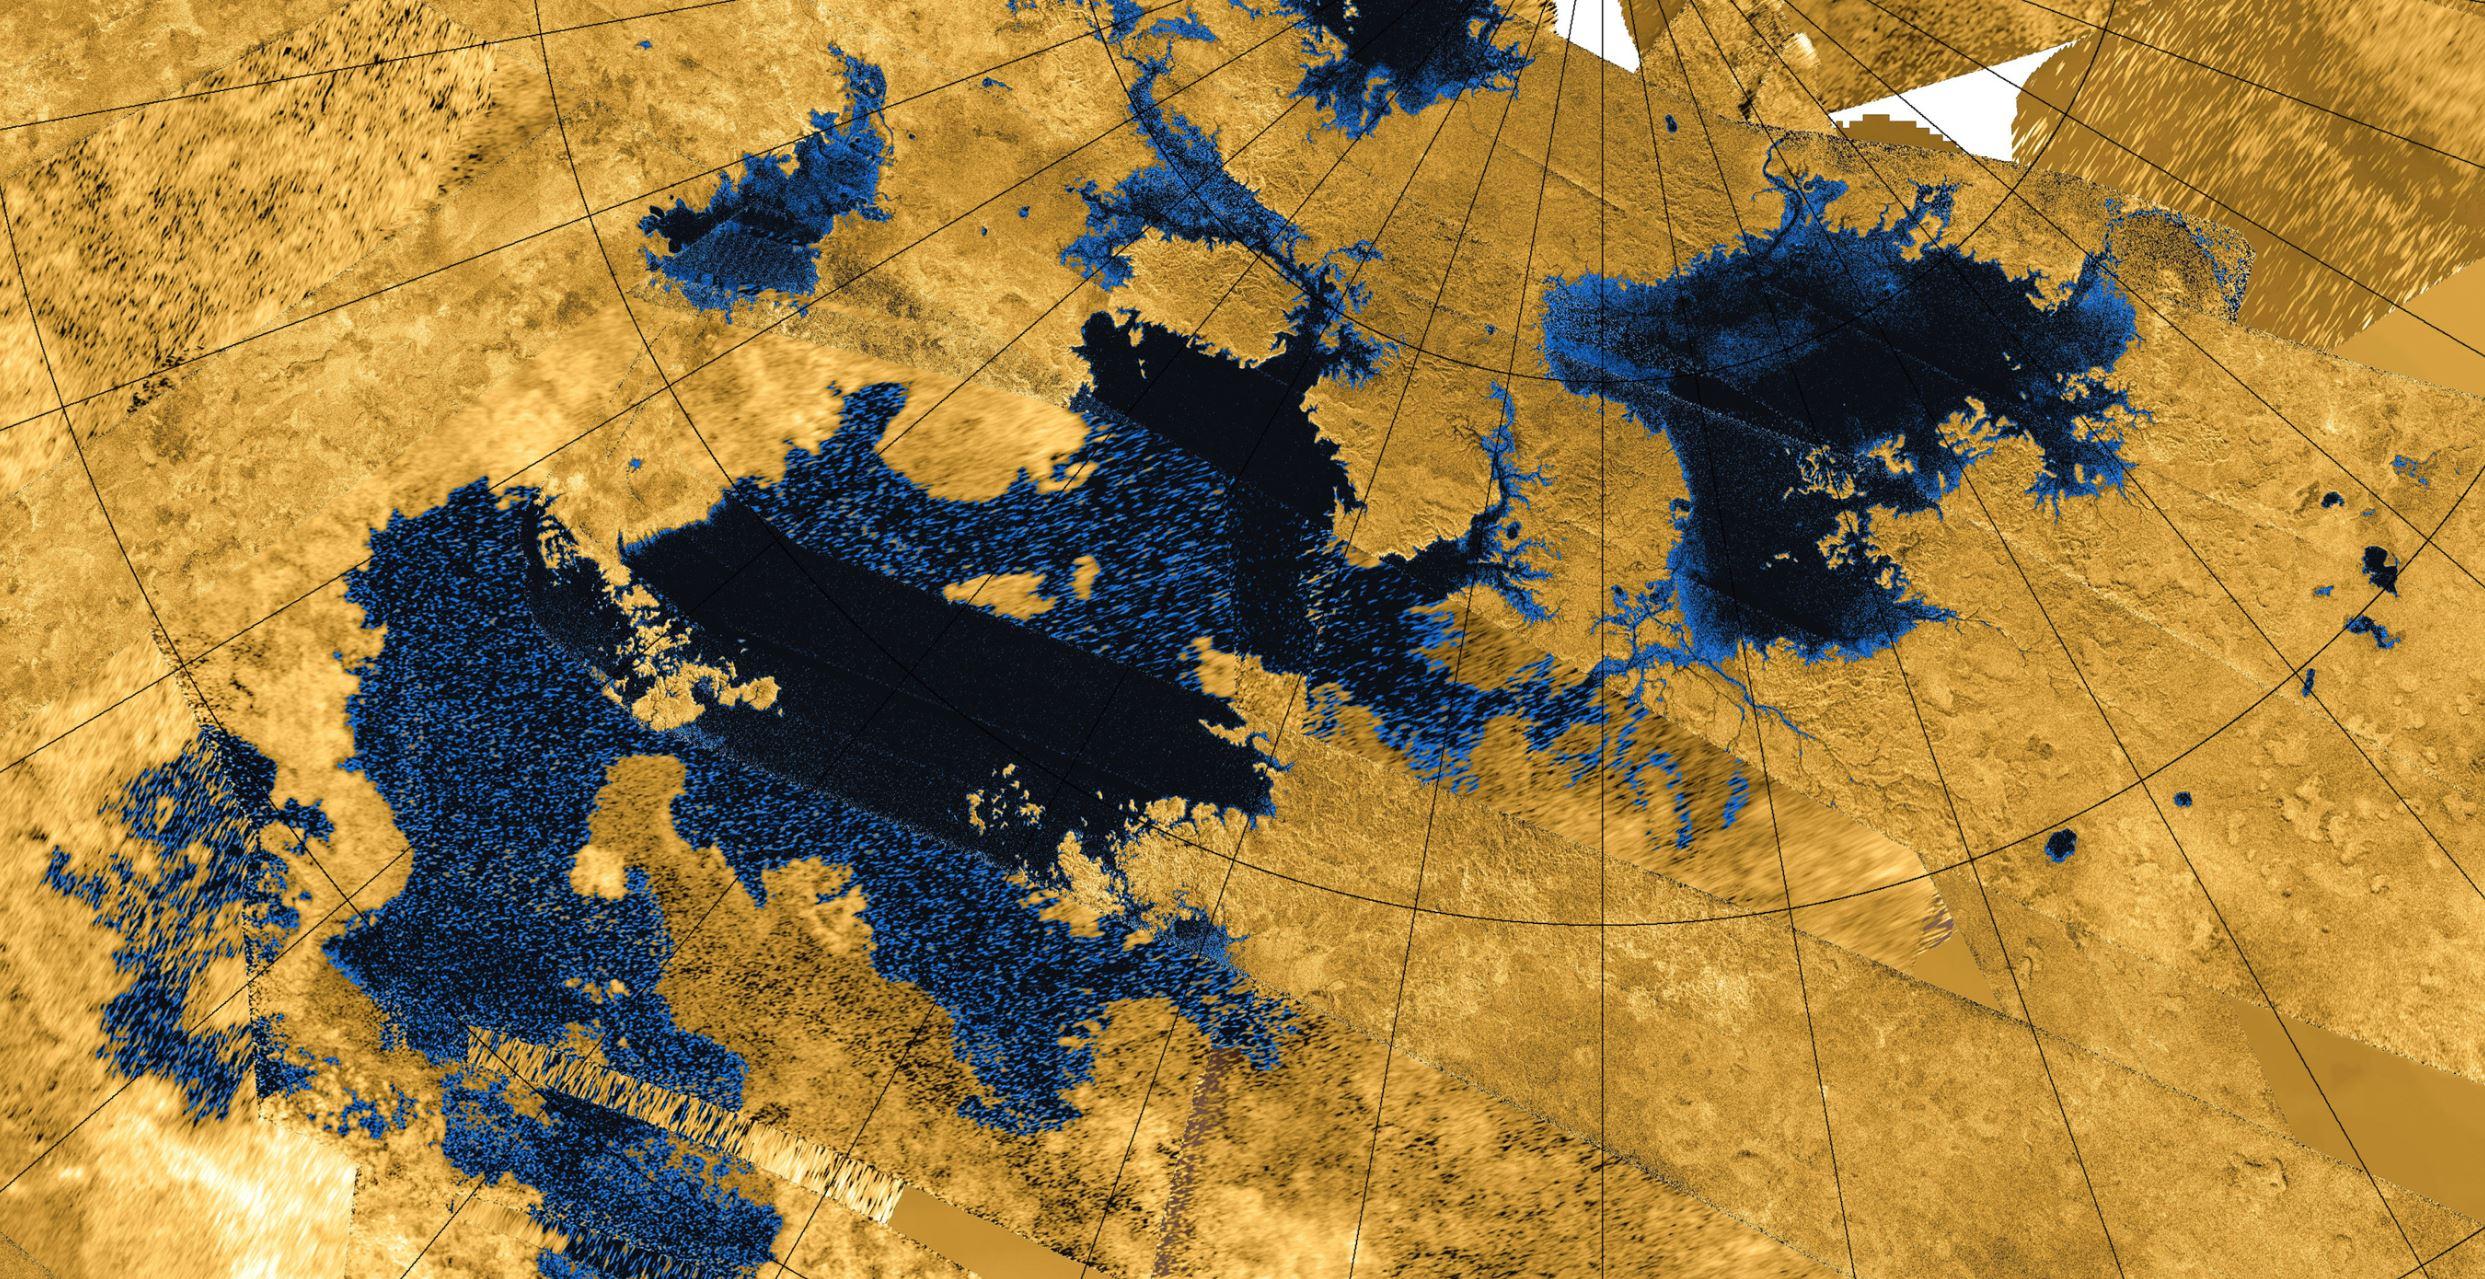 Image Credits:  NASA/JPL-Caltech/Agenzia Spaziale Italiana / USGS via Wikimedia Commons  (Cropped by  Universal-Sci )